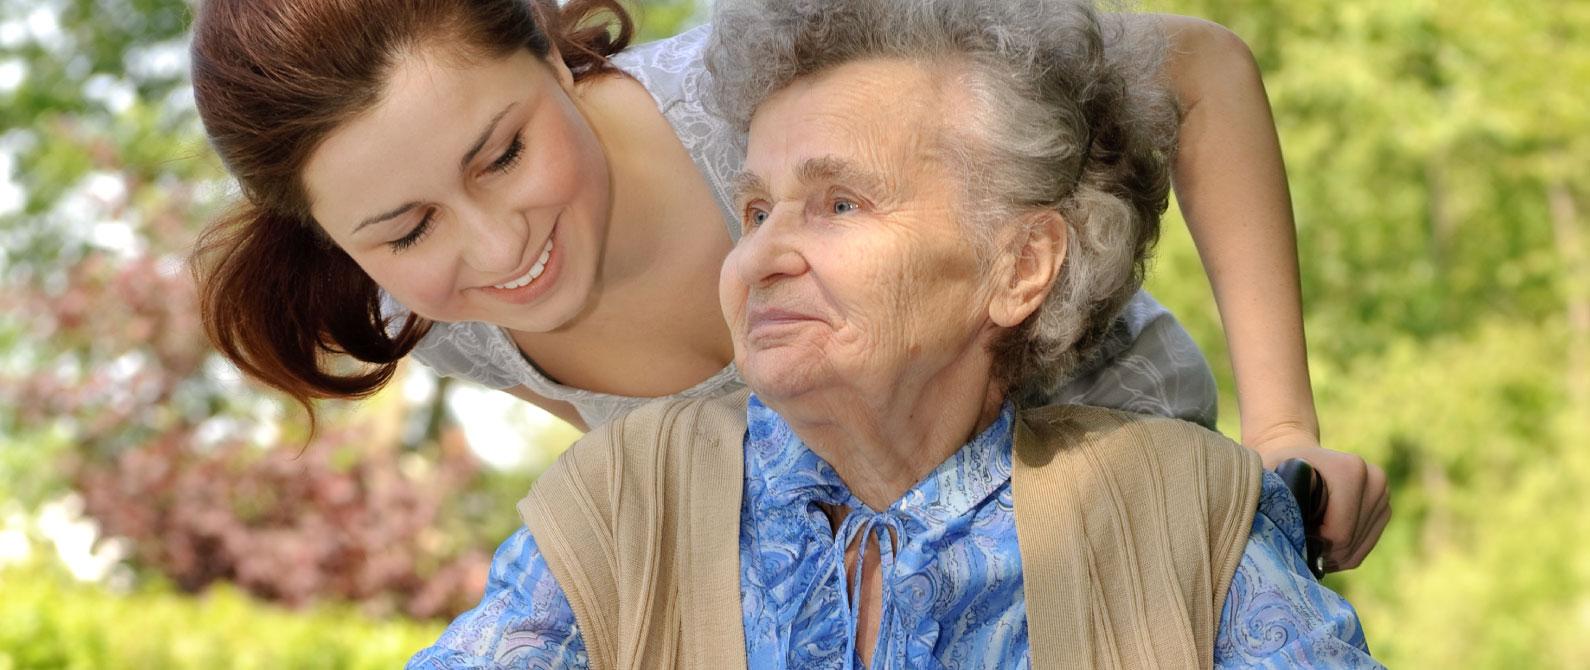 престарелый инвалид